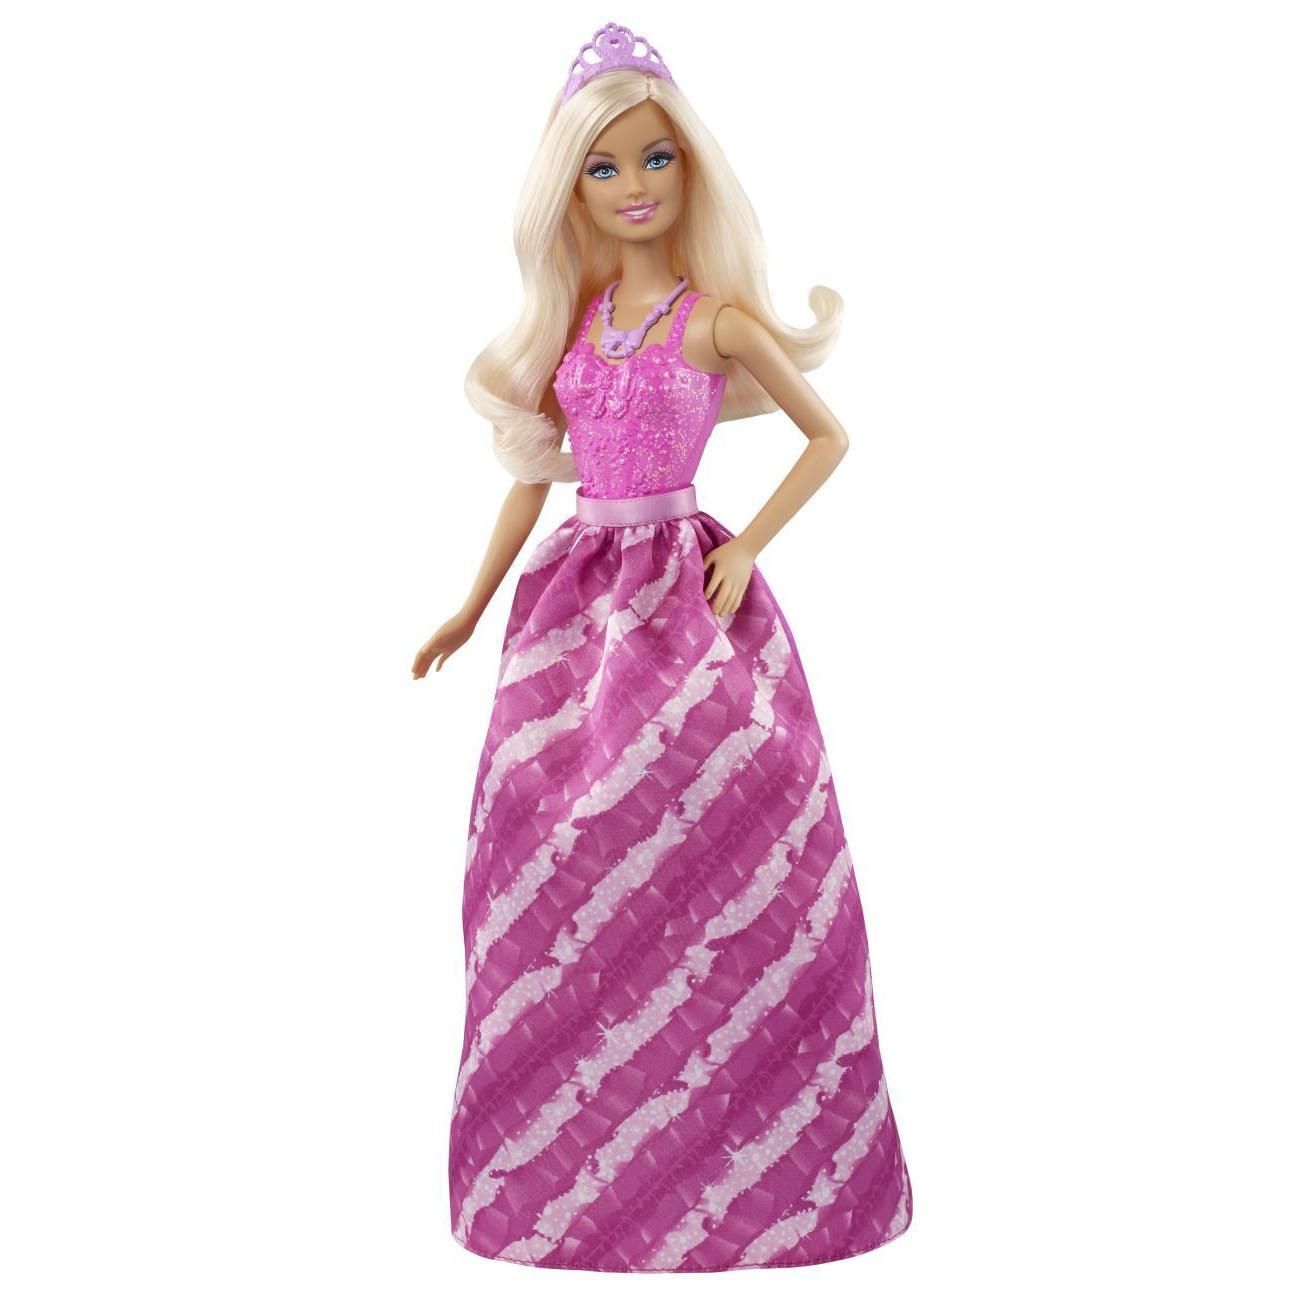 Barbie a fashion fairytale games for girls 80